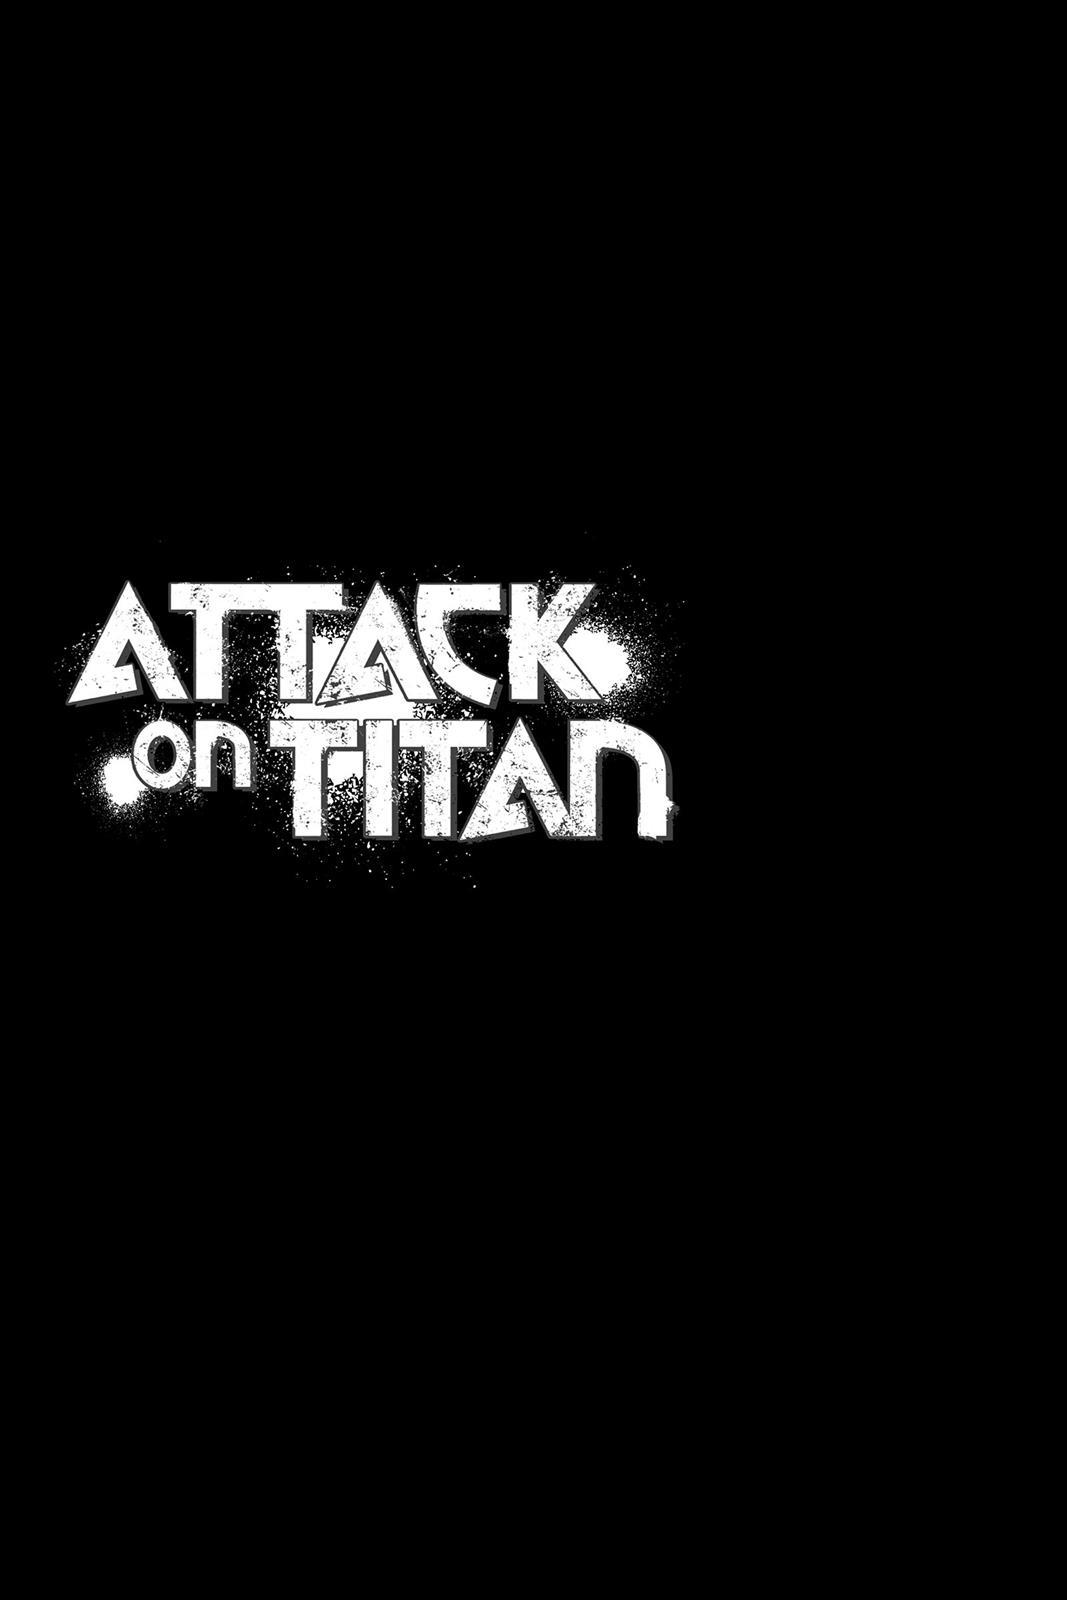 Attack On Titan, Episode 80 image 046